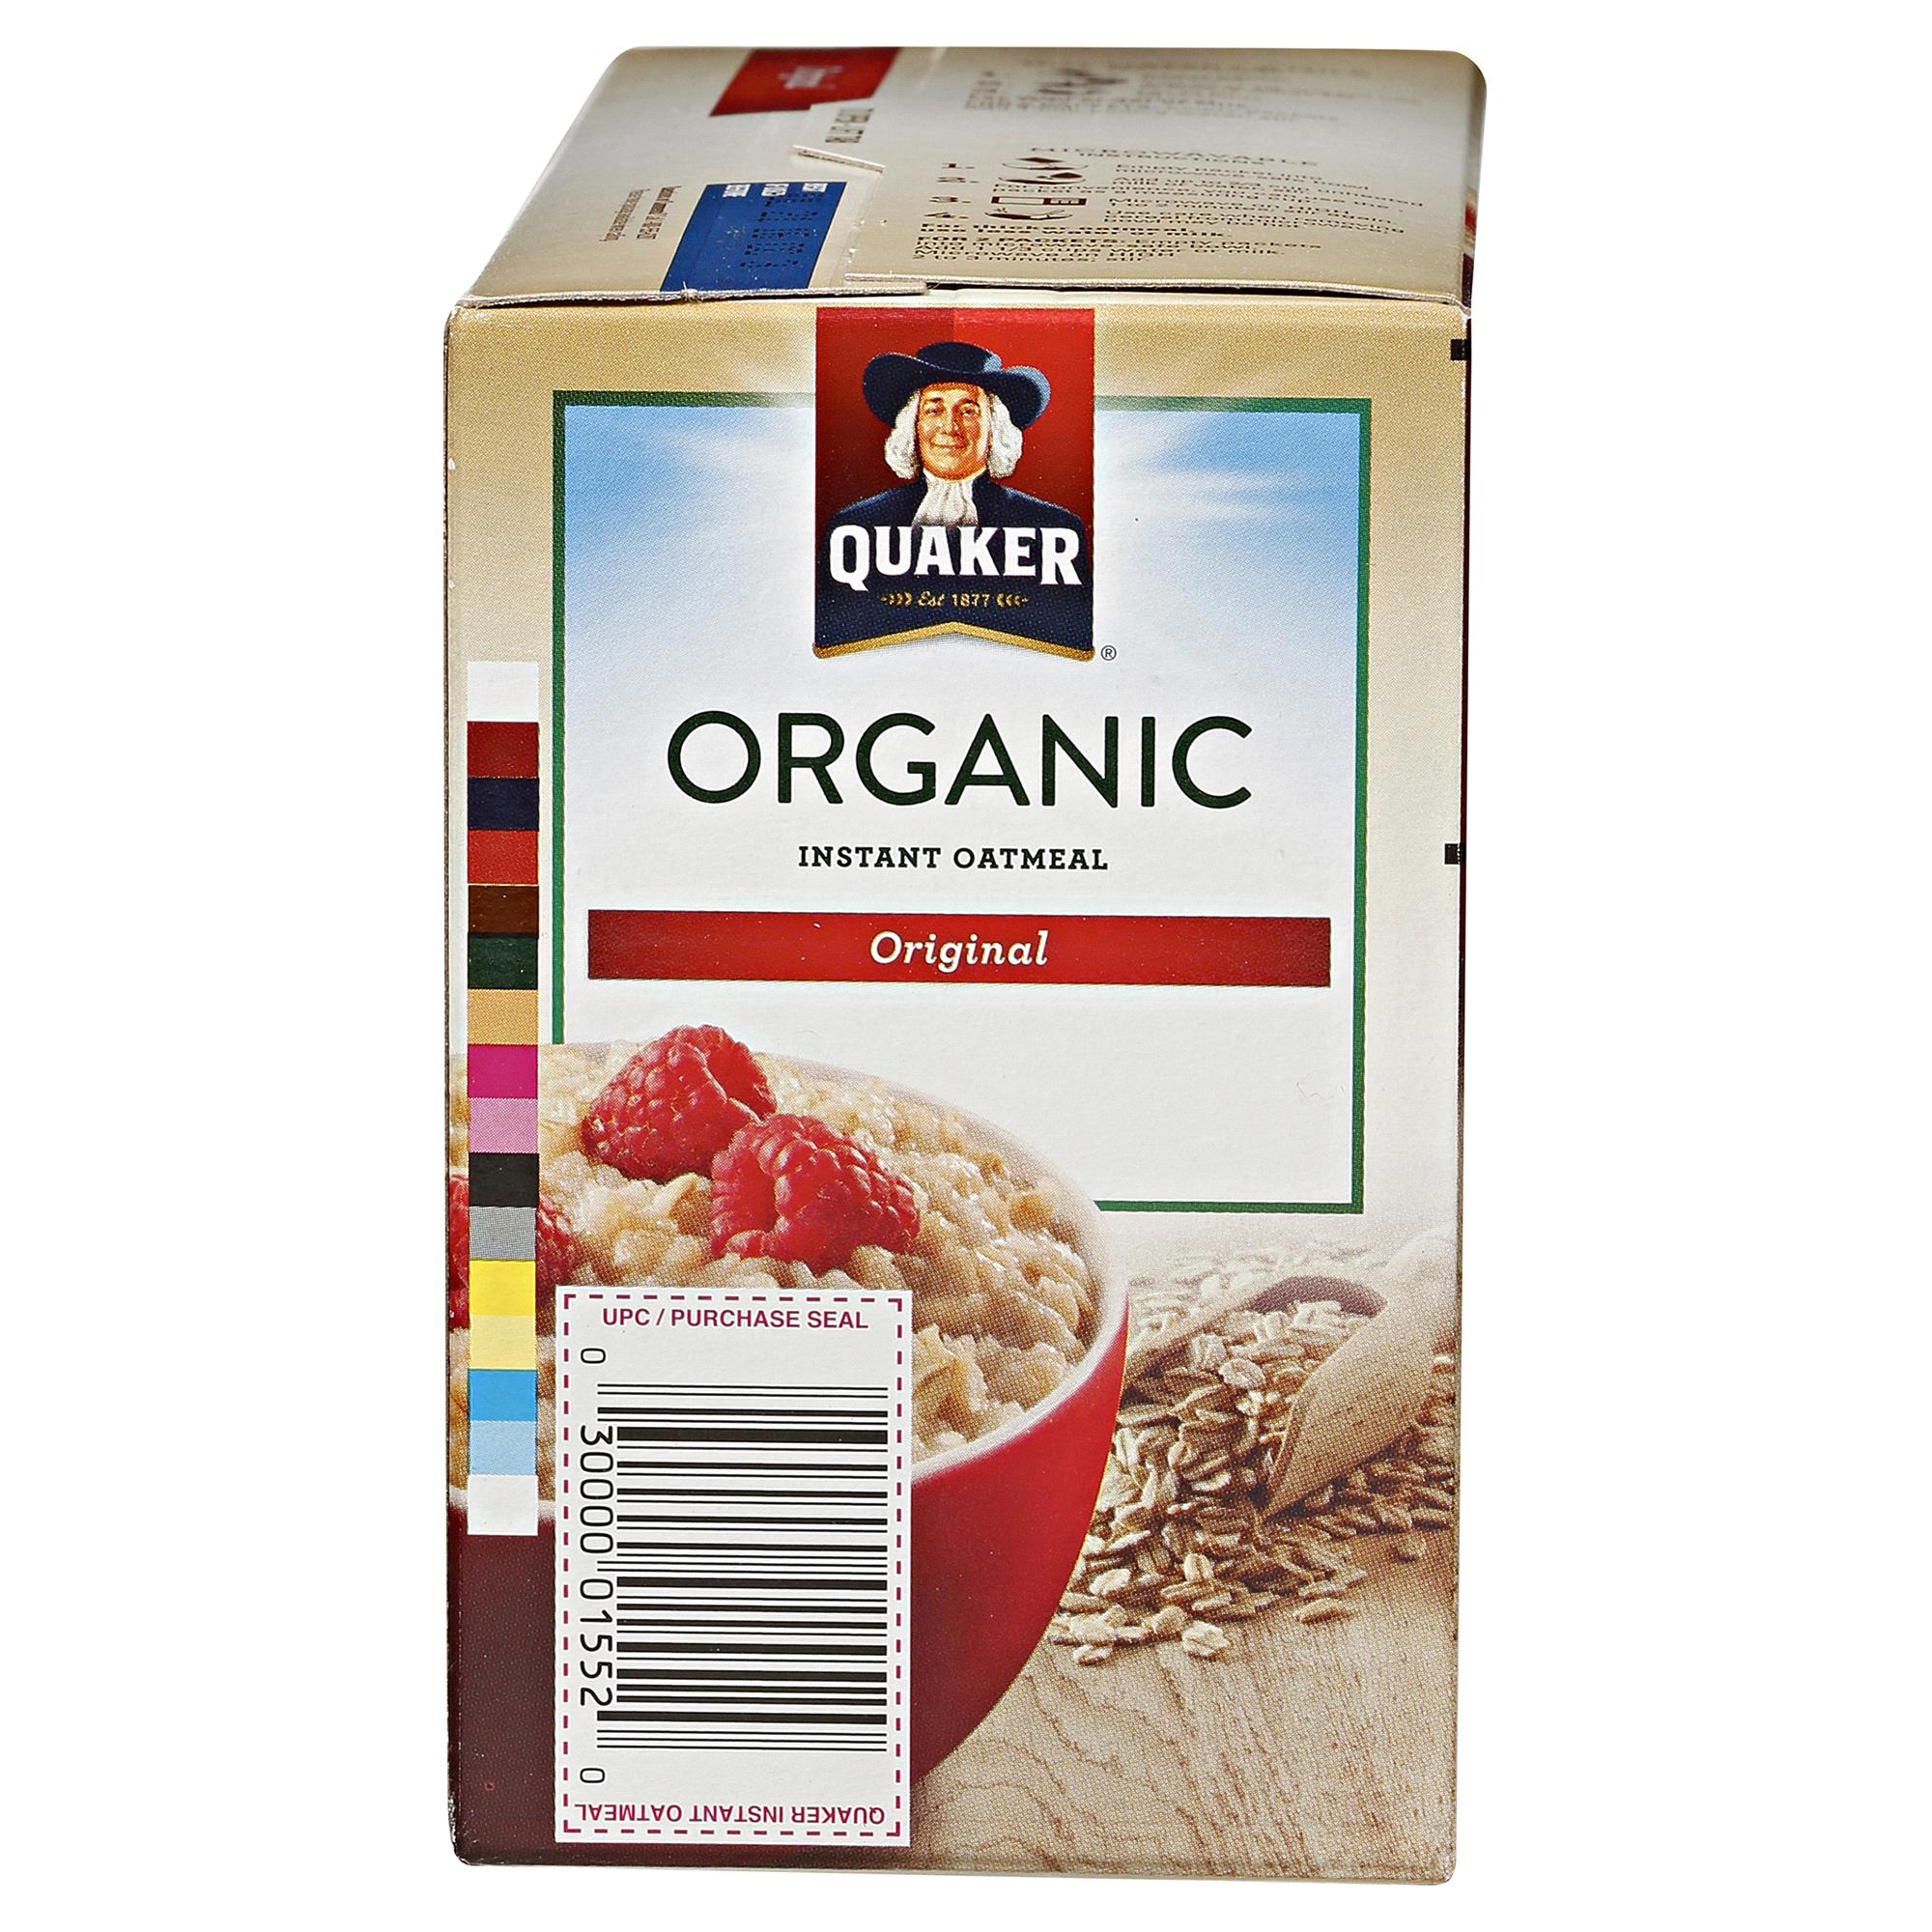 Quaker Select Starts Organic Instant Oatmeal Original 79 Oz Jar 1 Carton 12 Pcs P